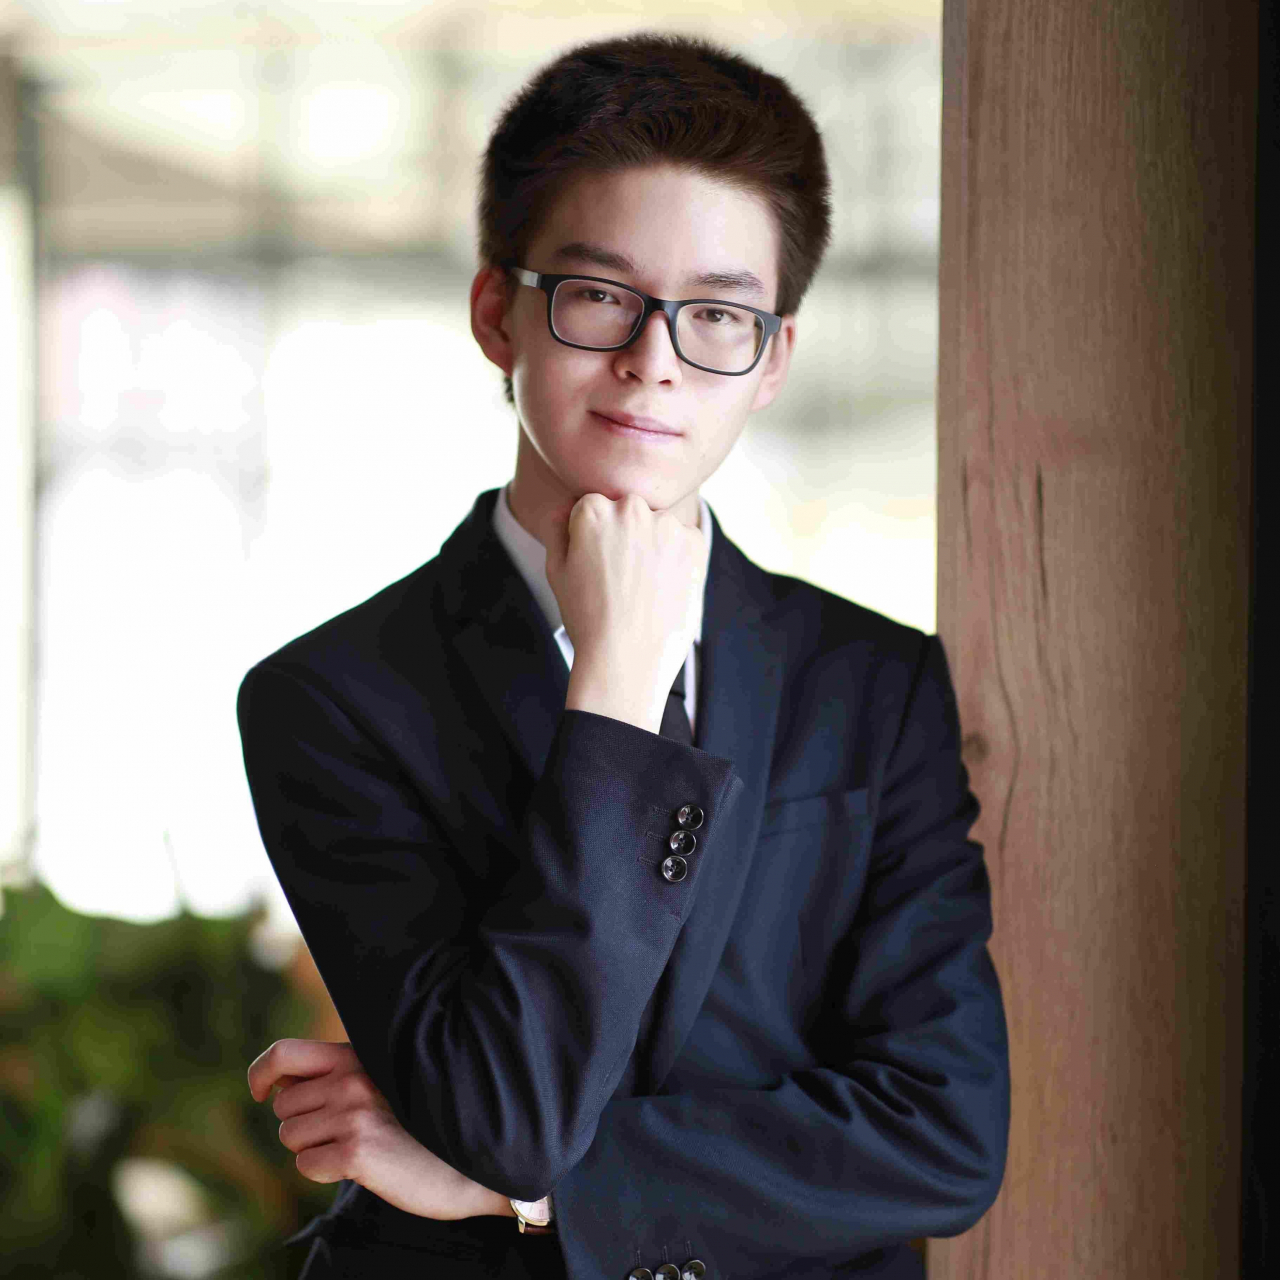 Success story of Rauan Khangerey, Haileybury Astana graduate